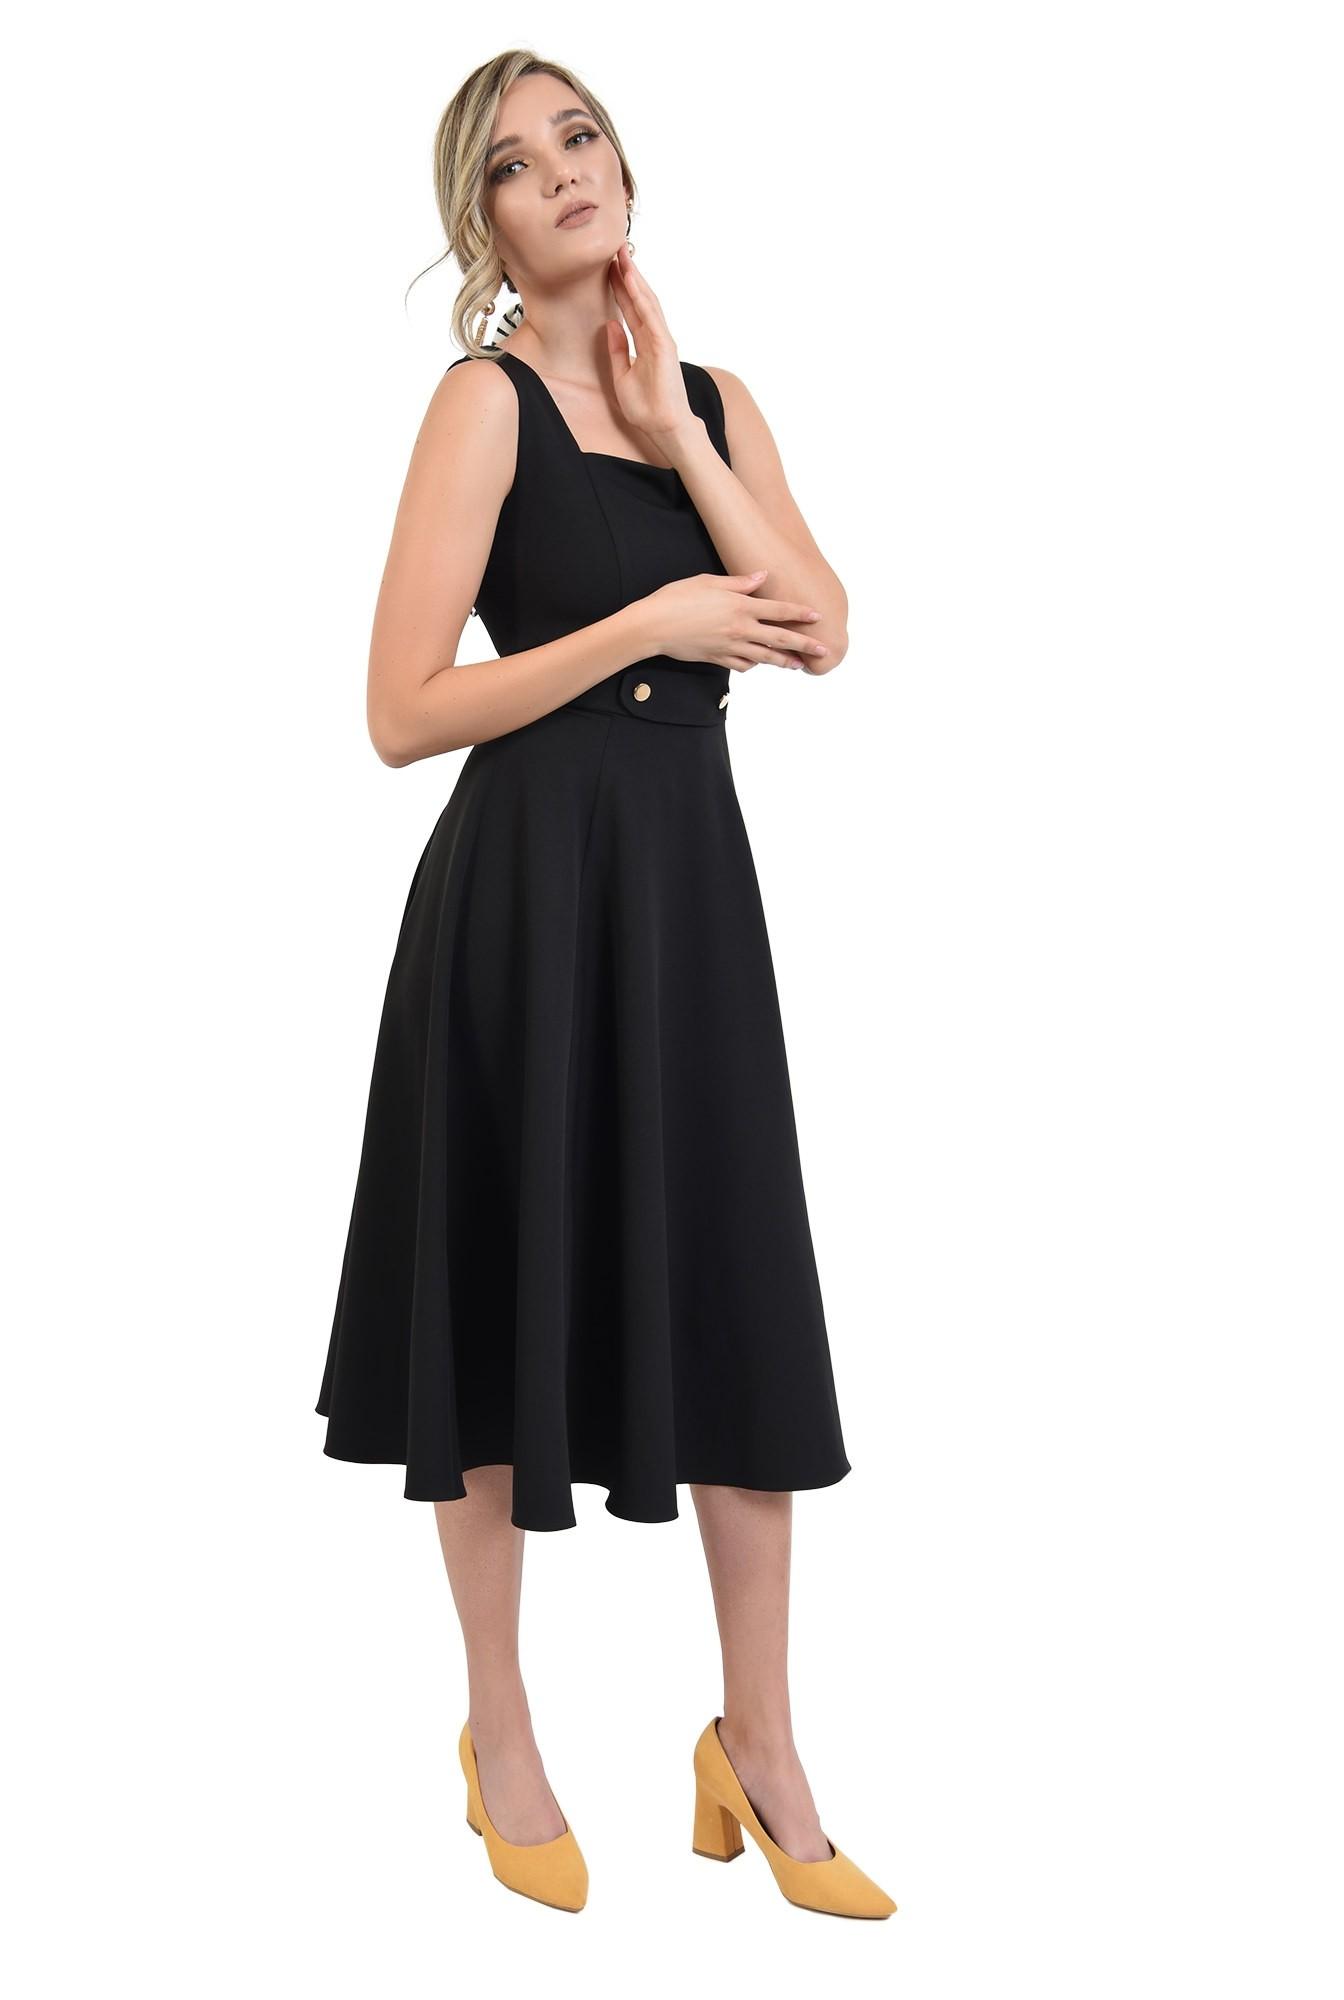 3 - 360 - rochie neagra, cu detaliu la talie, evazata, Poema